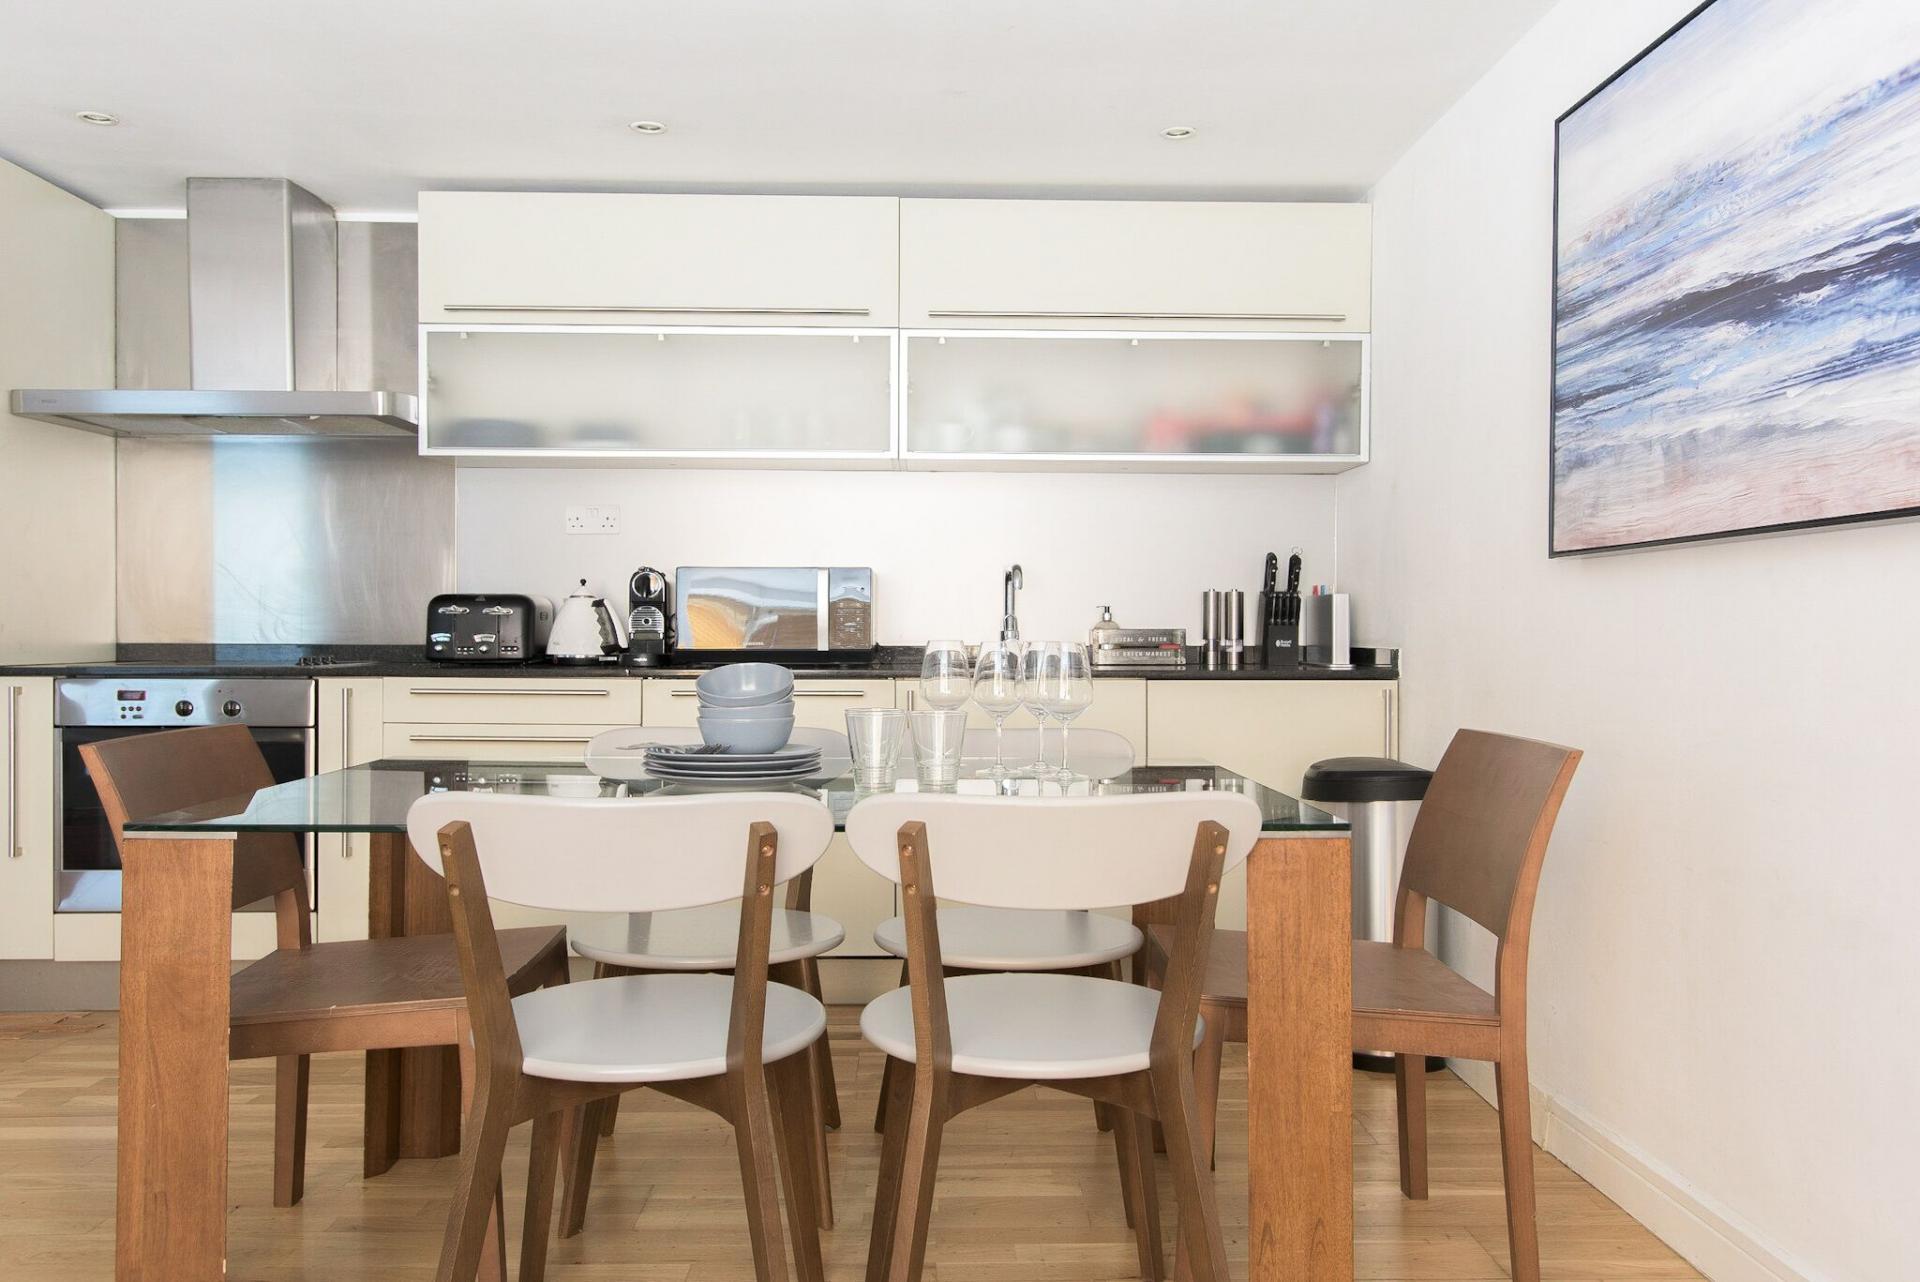 Kitchen at The Paddington Maisonette, Paddington, London - Citybase Apartments